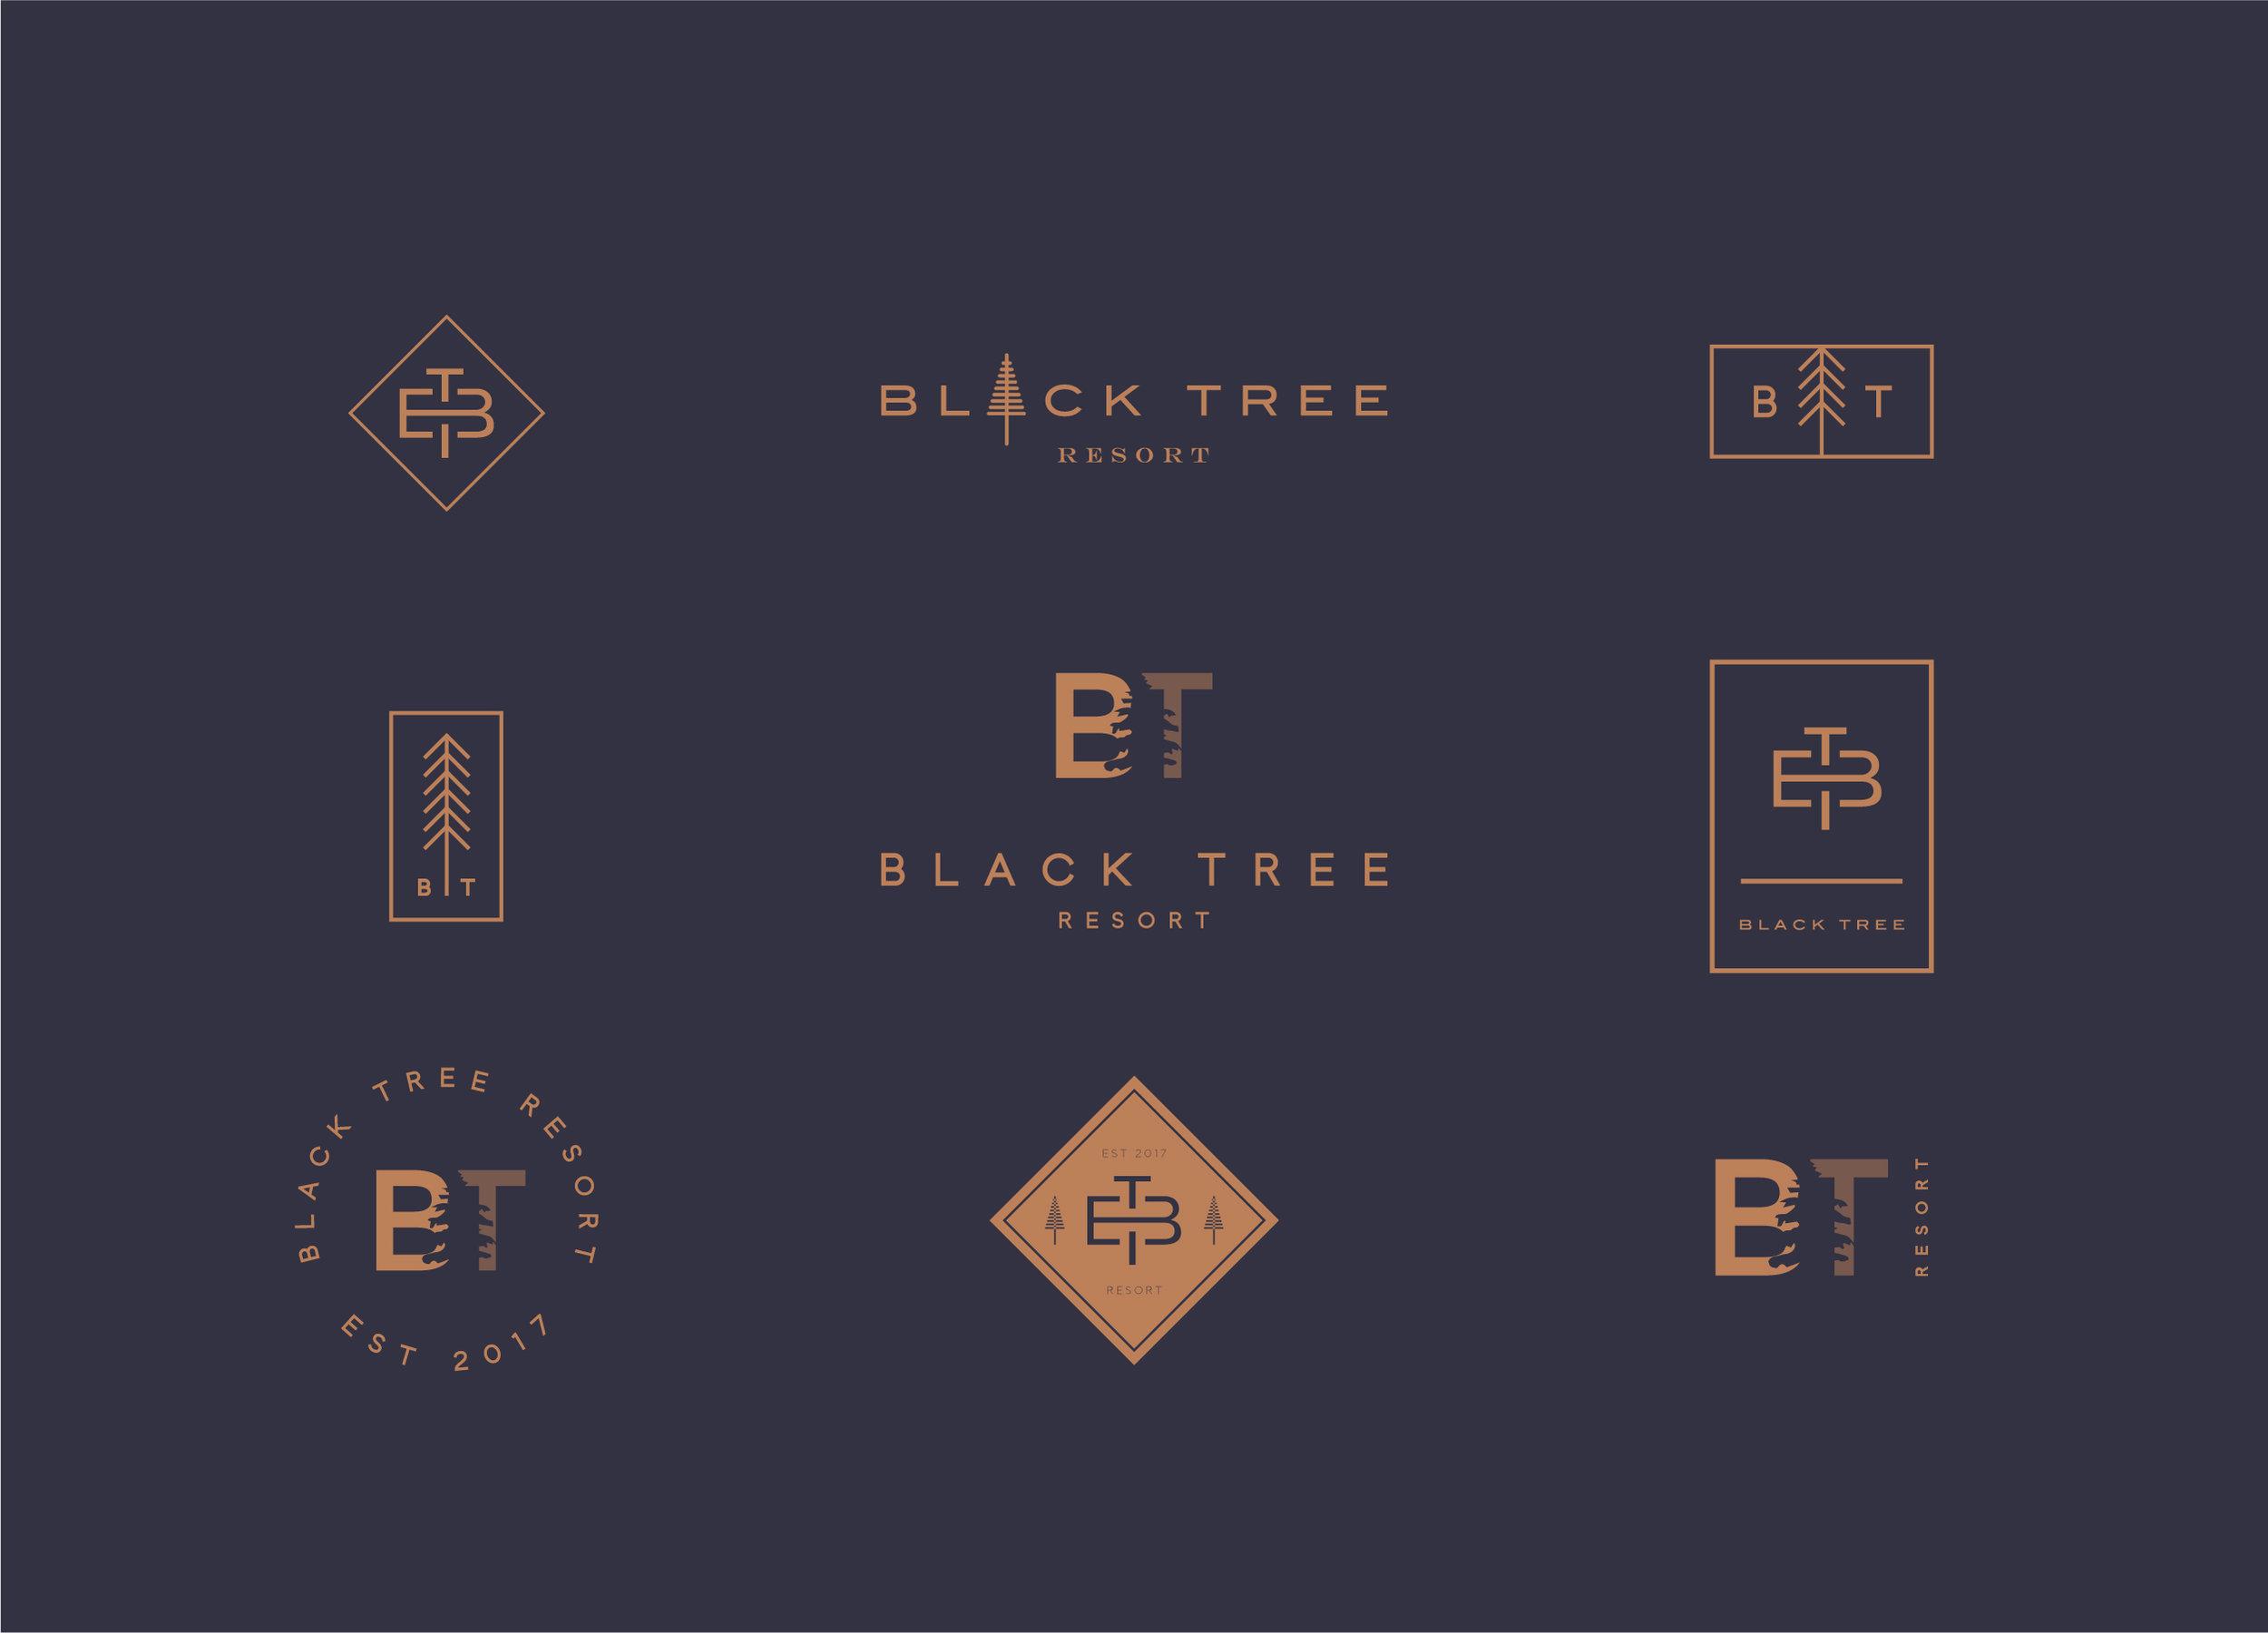 CANOPY_Black Tree Resort_Branding_Logo Design 02.jpg